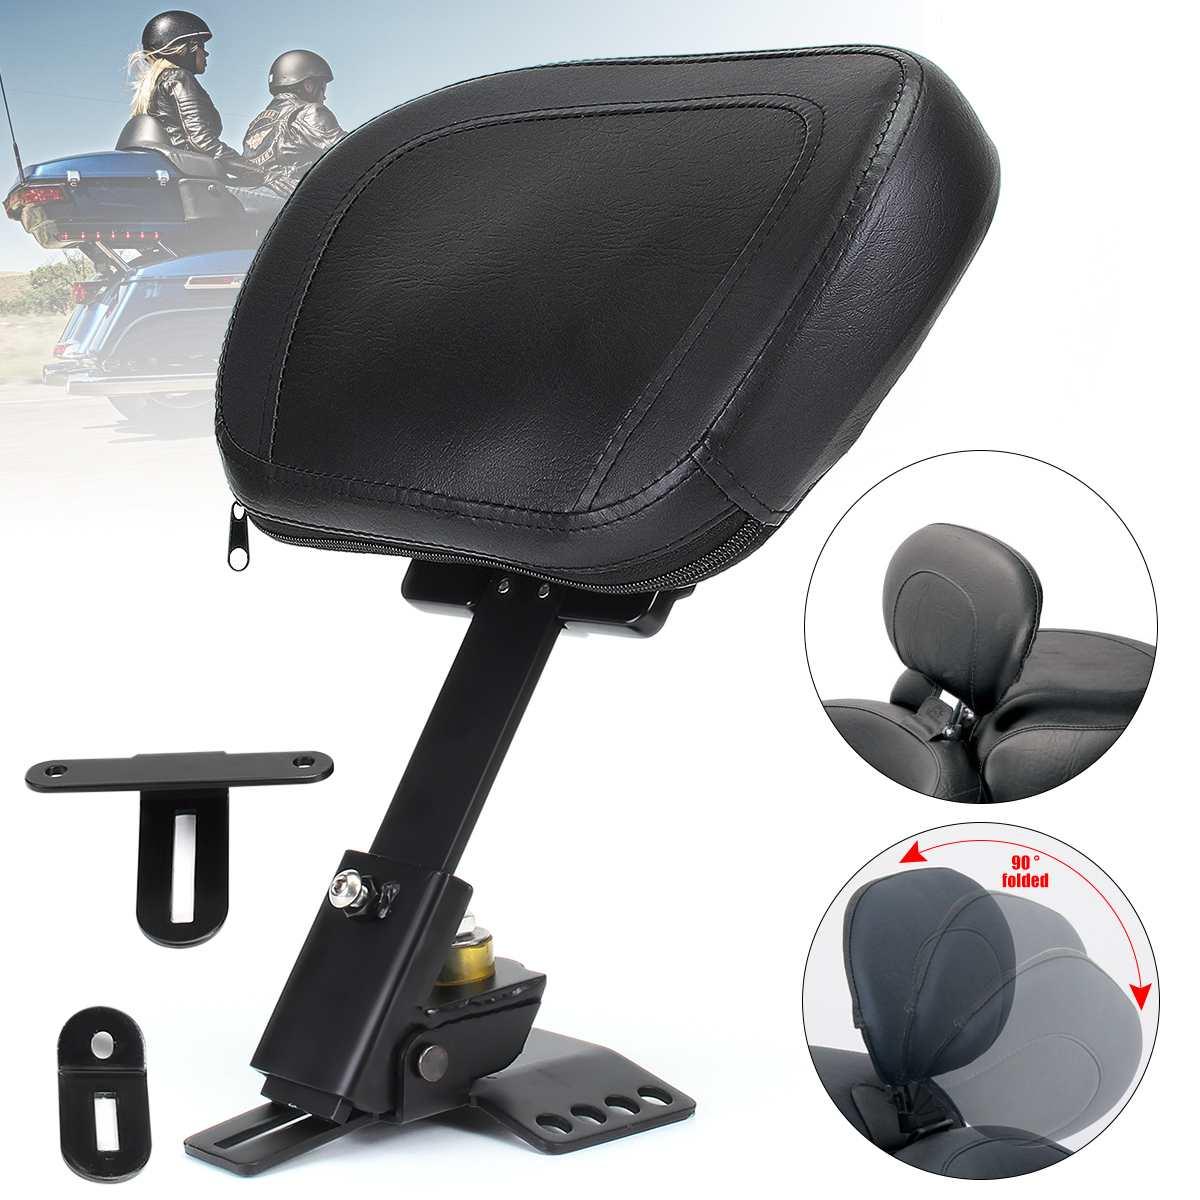 Adjustable Motorcycle Driver Rider Leather Seat Cushion Backrest Black For Harley Davidson-Road/Street/Electra Glide 1988-2016